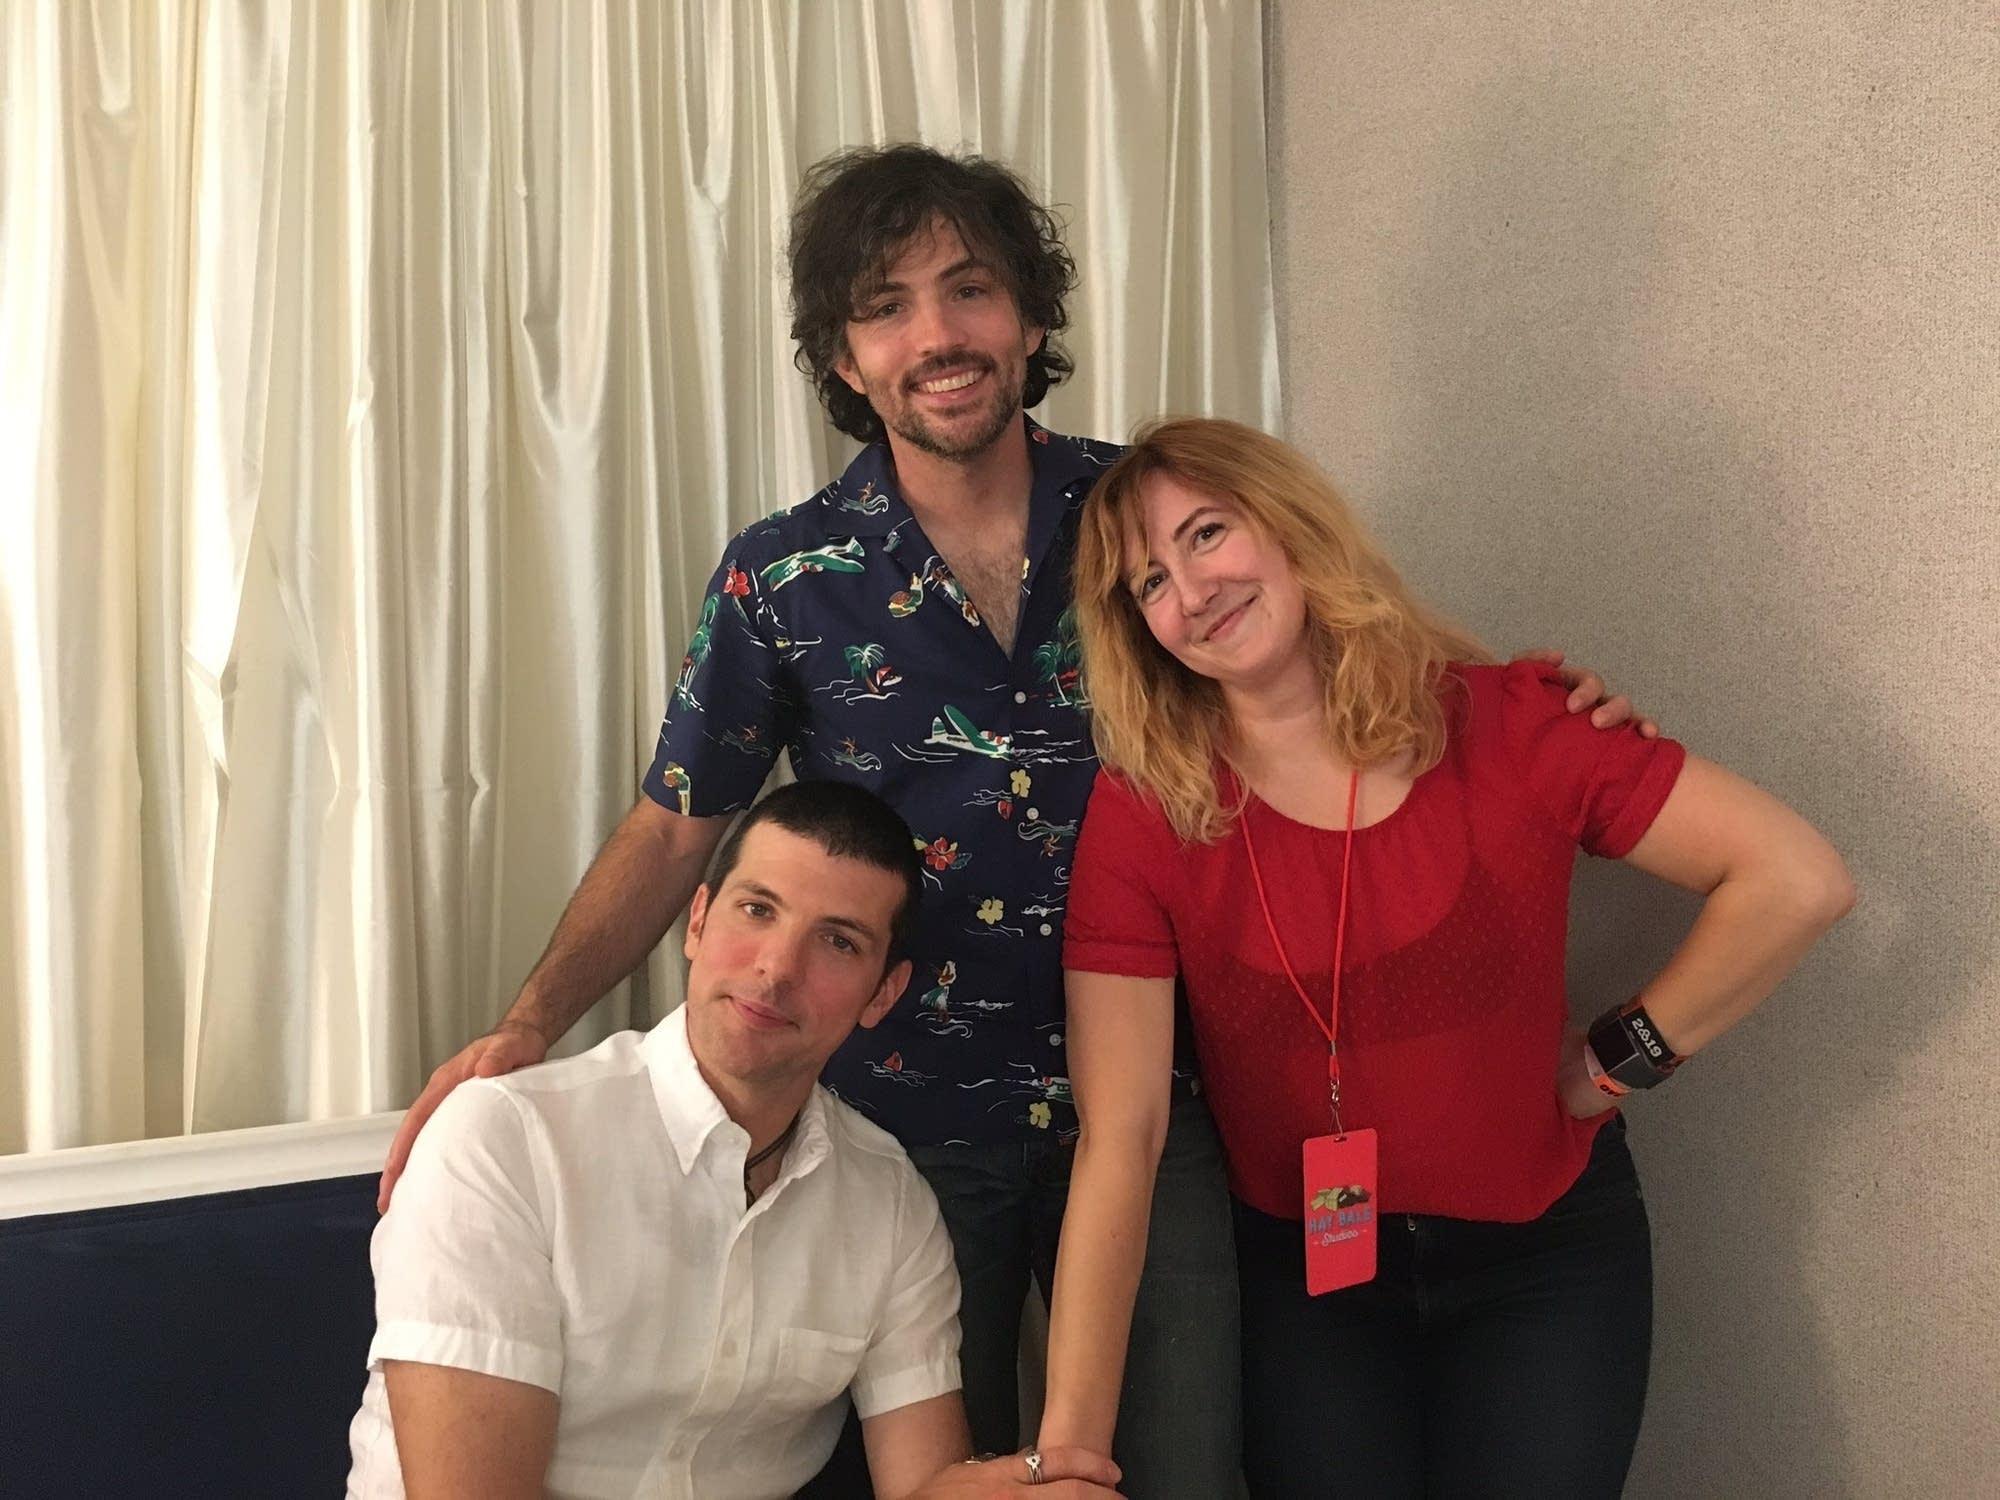 Jade with Seth and Scott Avett at Bonnaroo